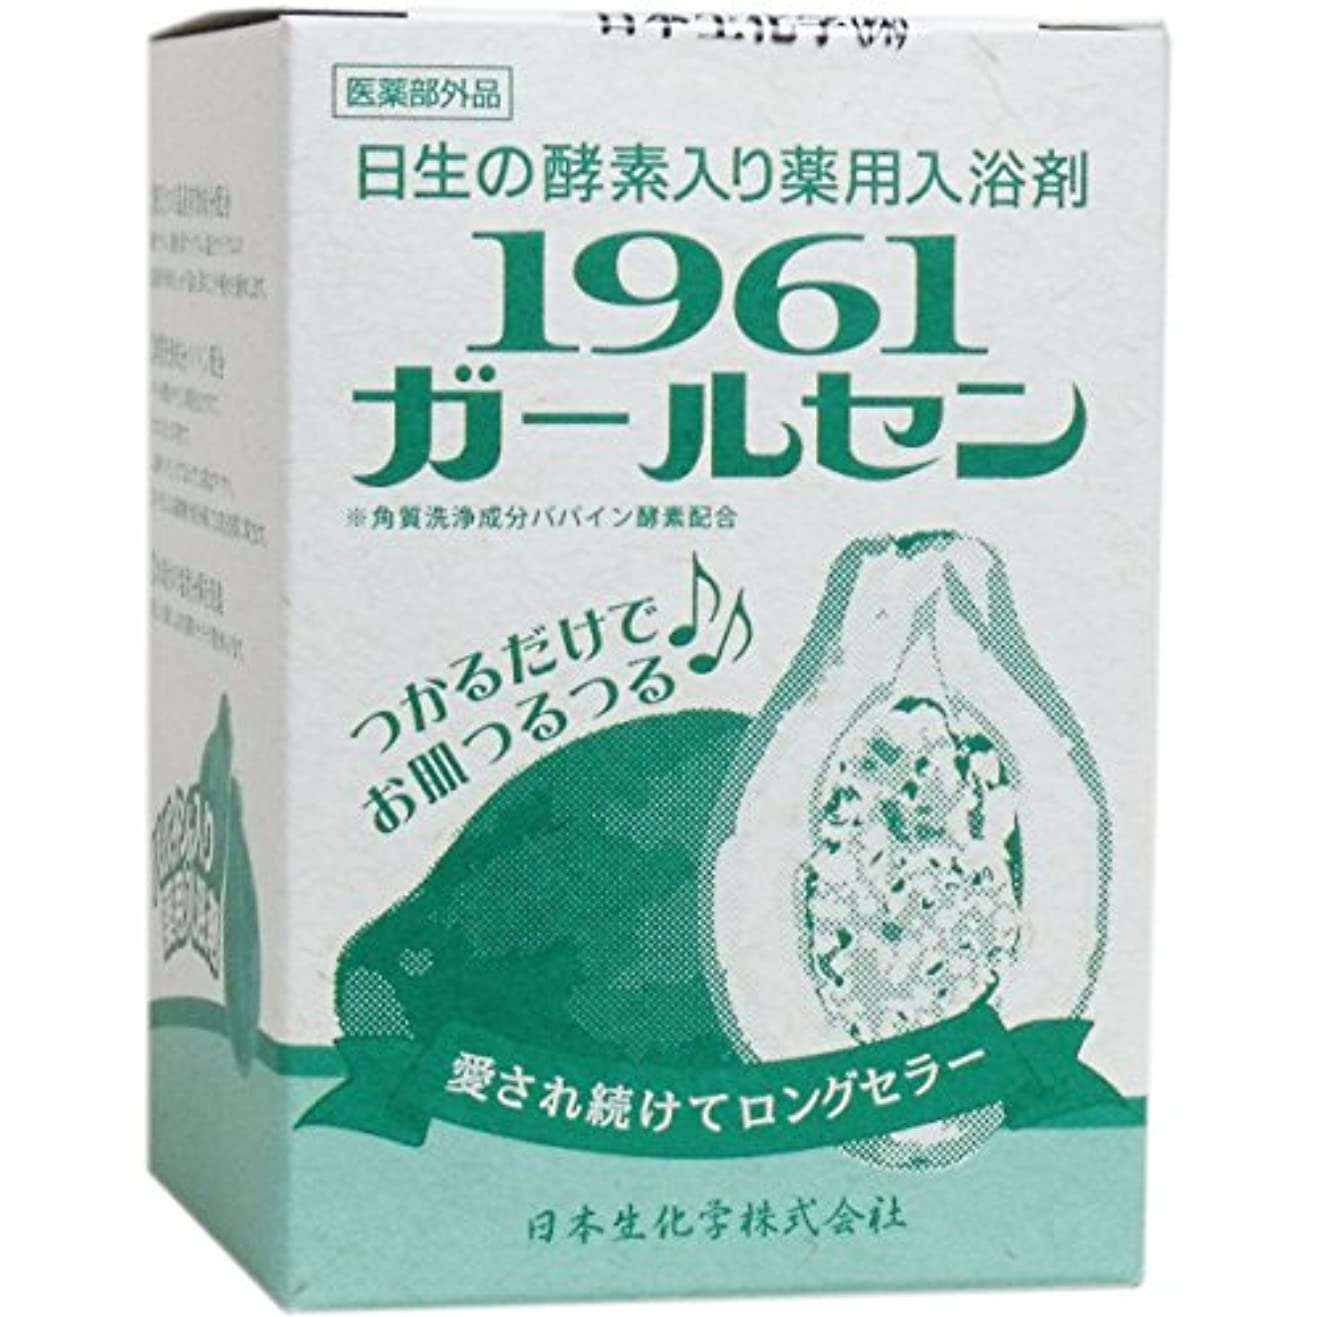 動機旅客前売酵素入り薬用入浴剤 1961ガールセン 10包入 [医薬部外品]